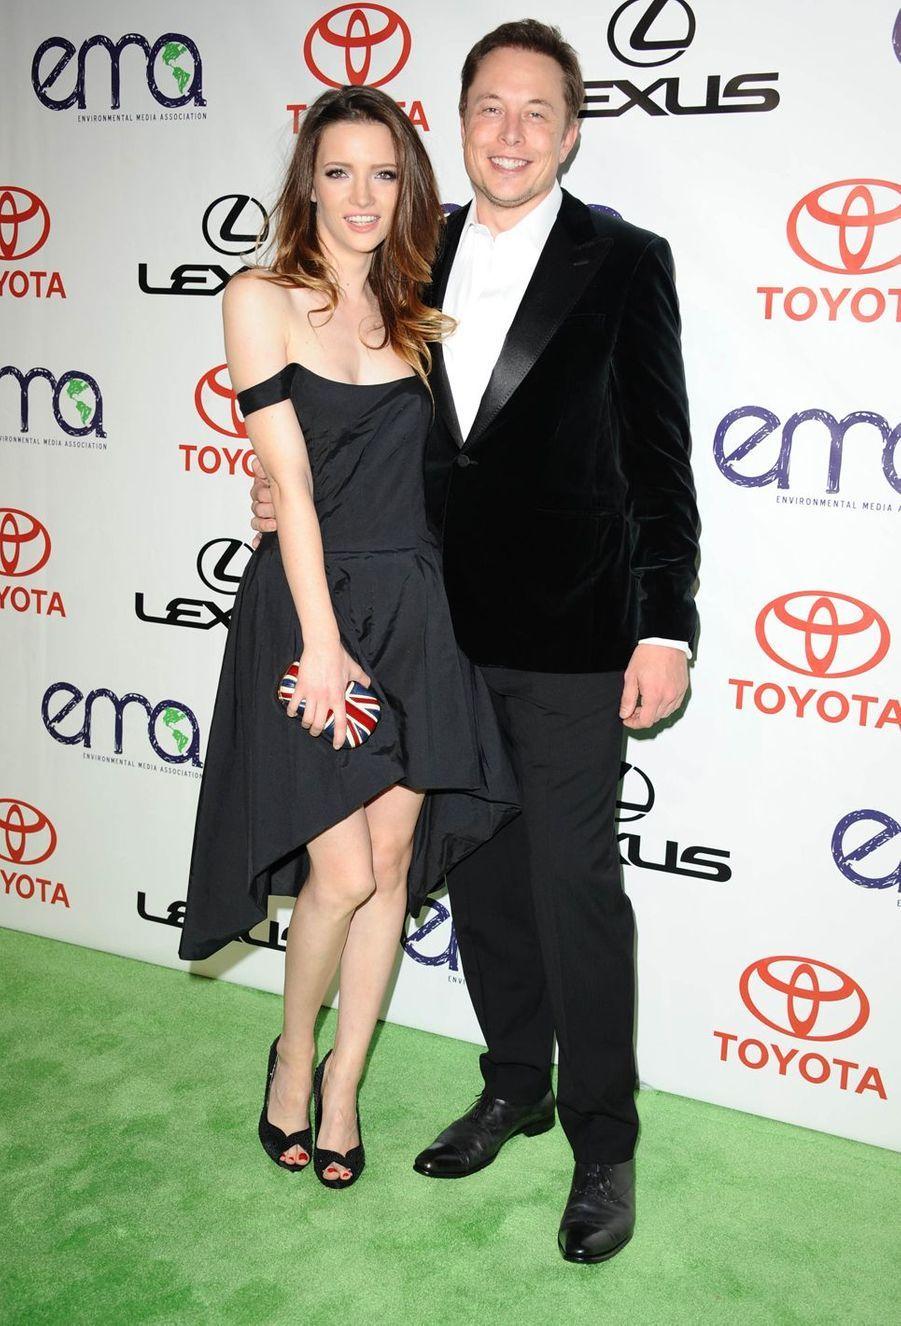 Talulah Riley et Elon Musk en 2012